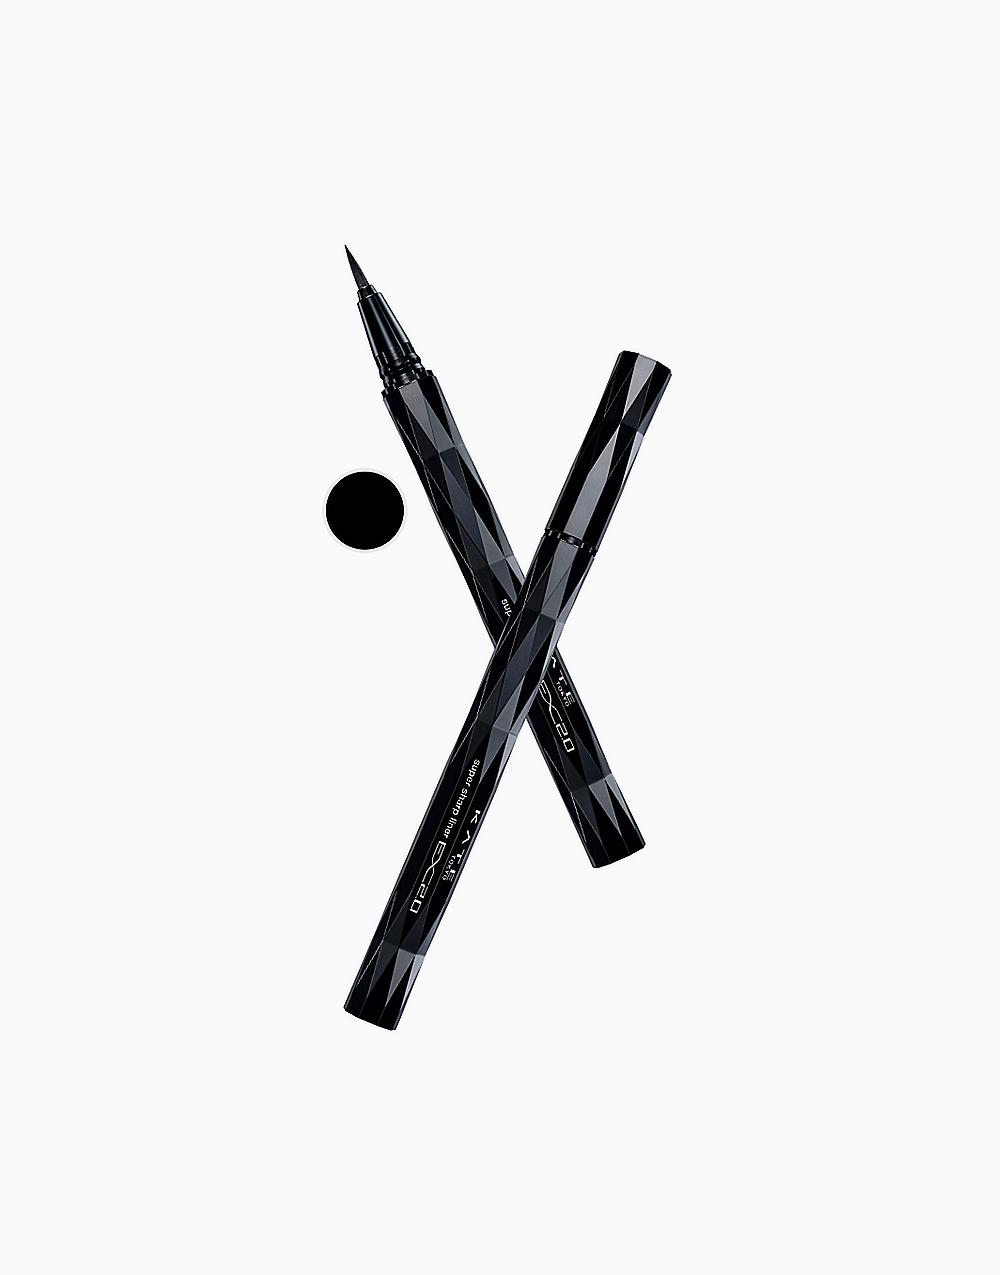 Supersharp Liner EX 2.0 by Kate Tokyo   BK1